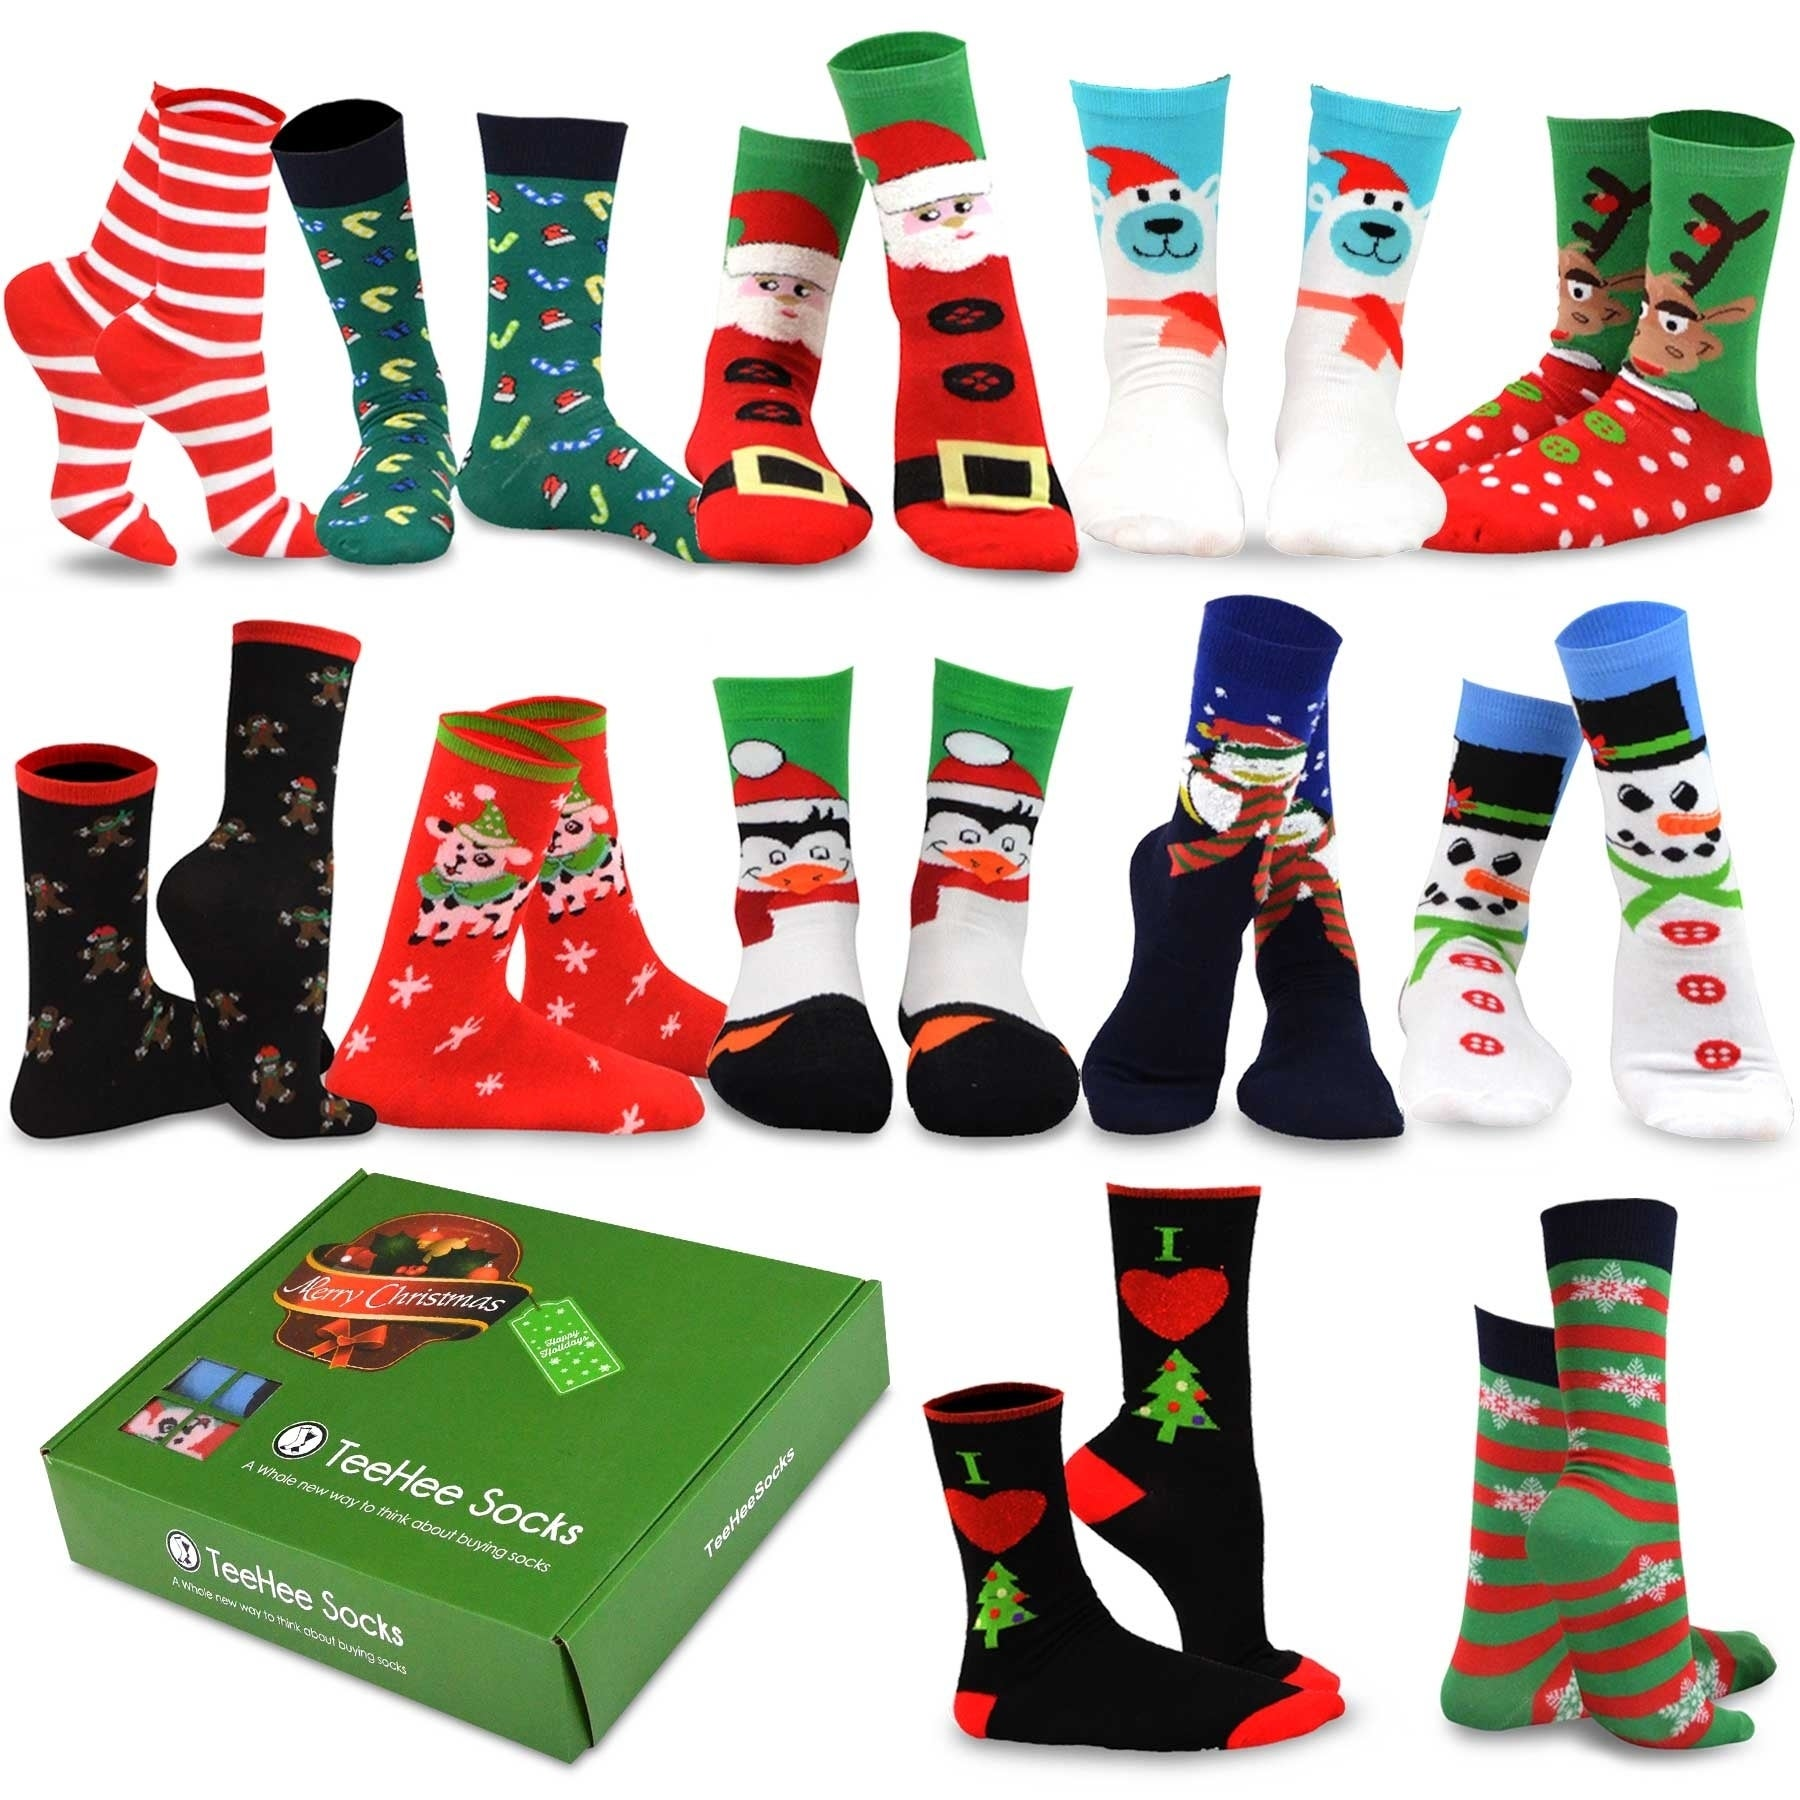 NEW Ladies Christmas Gift Socks 3 Pack Size 4-8